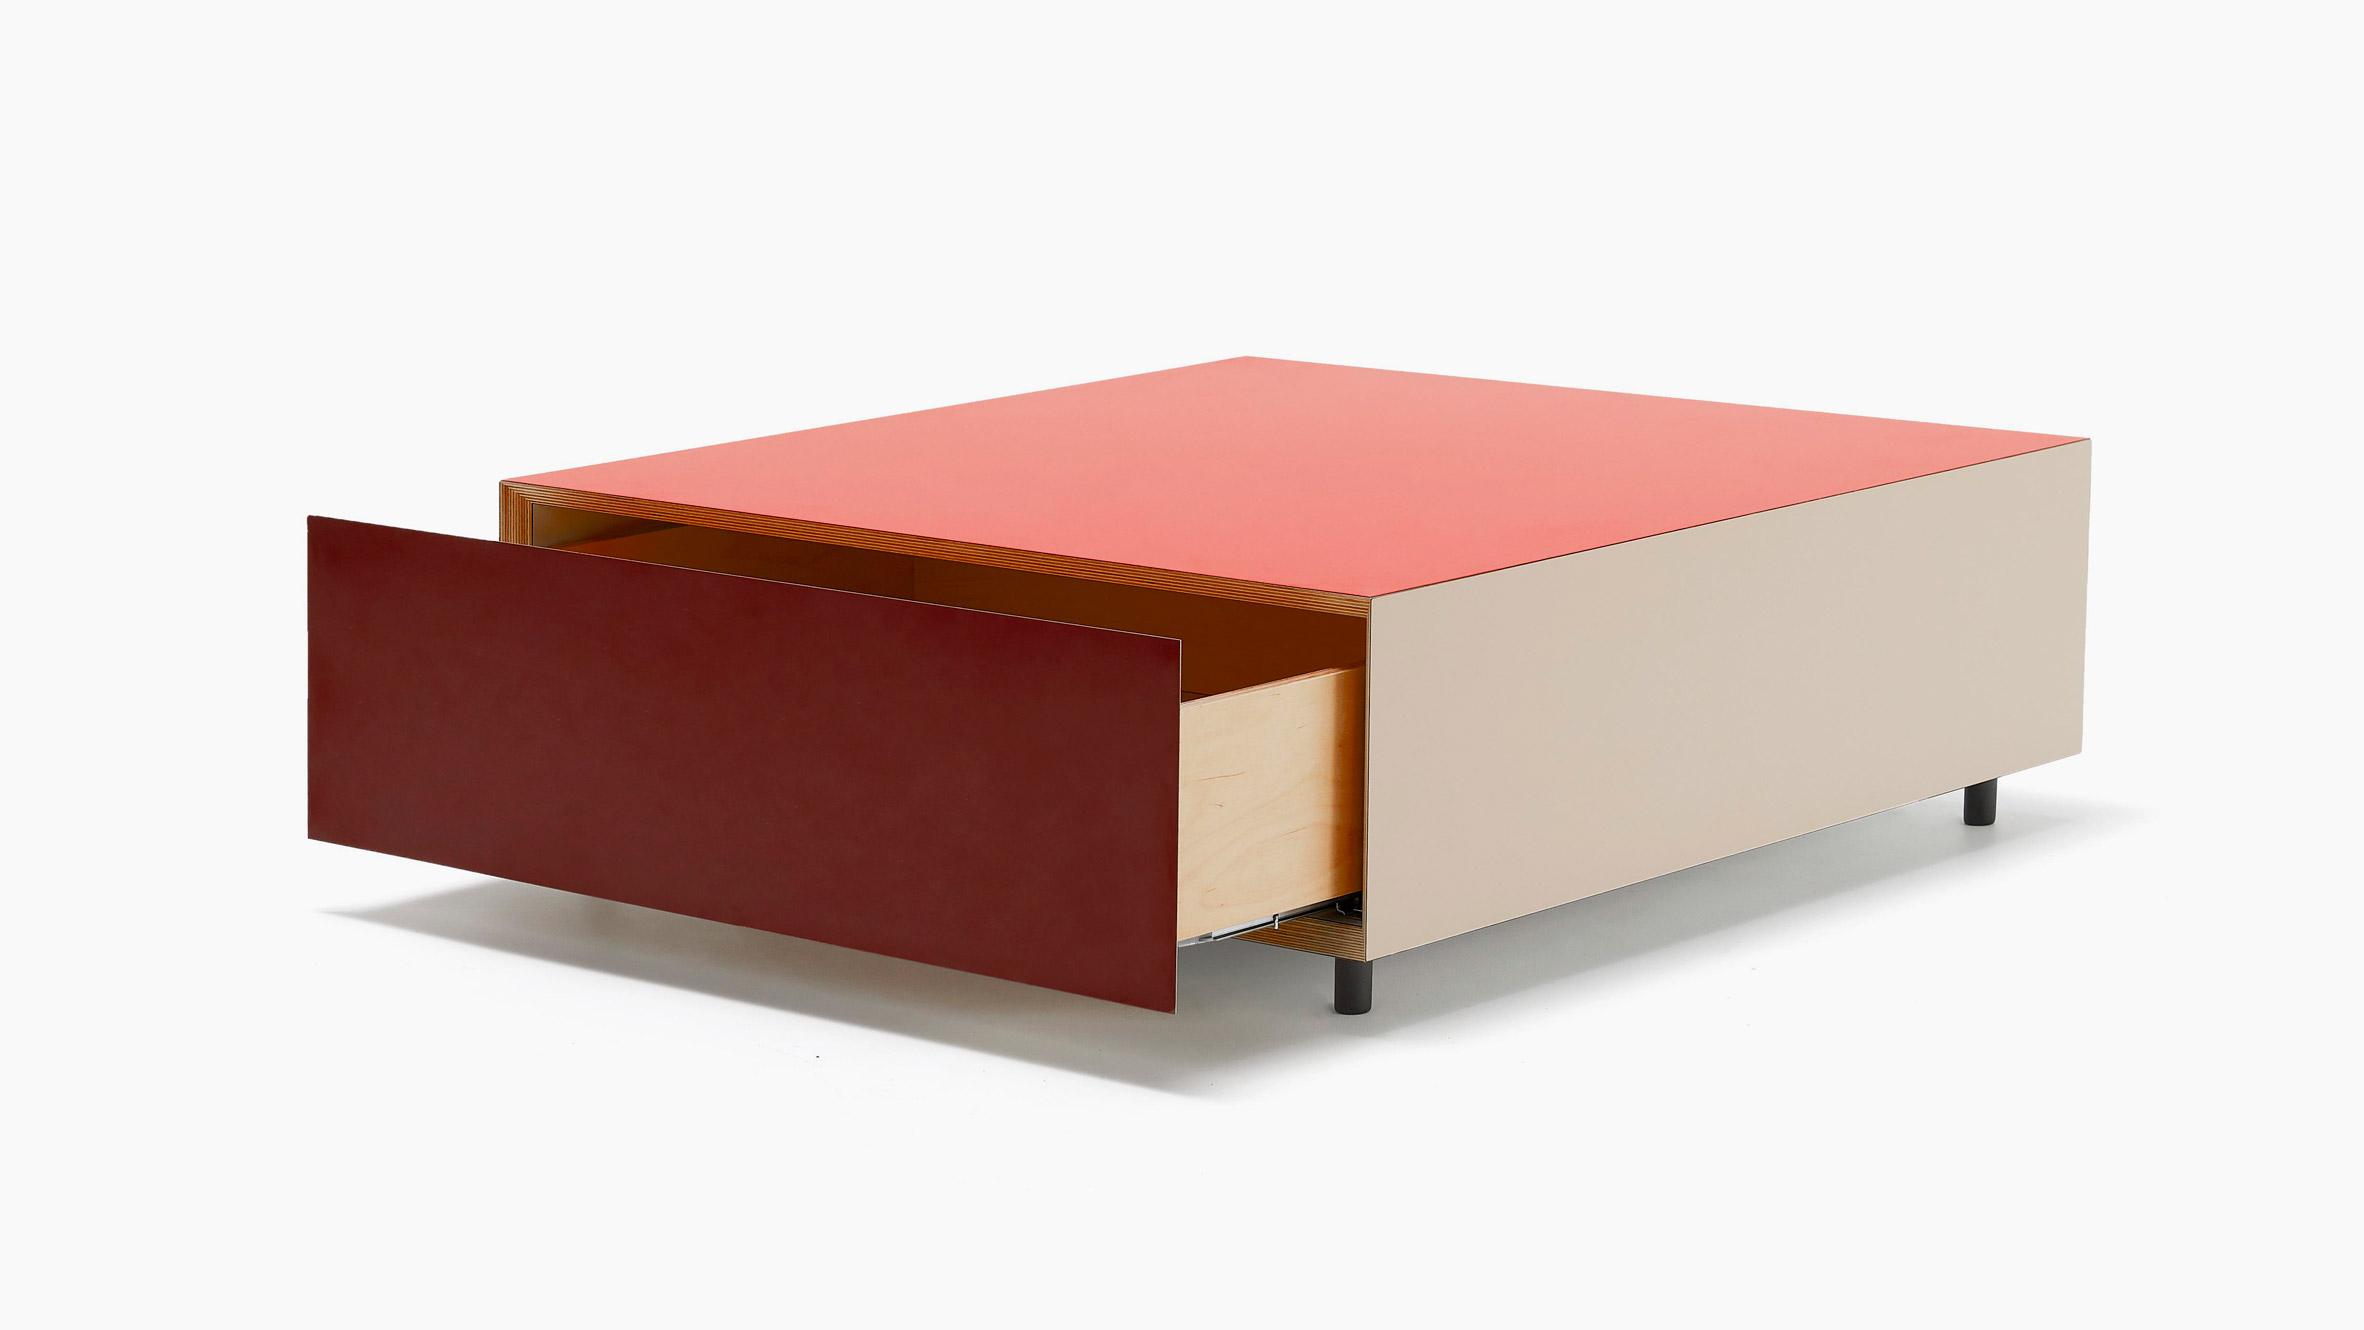 Bloc side tables by Pauline Deltour for Established & Sons